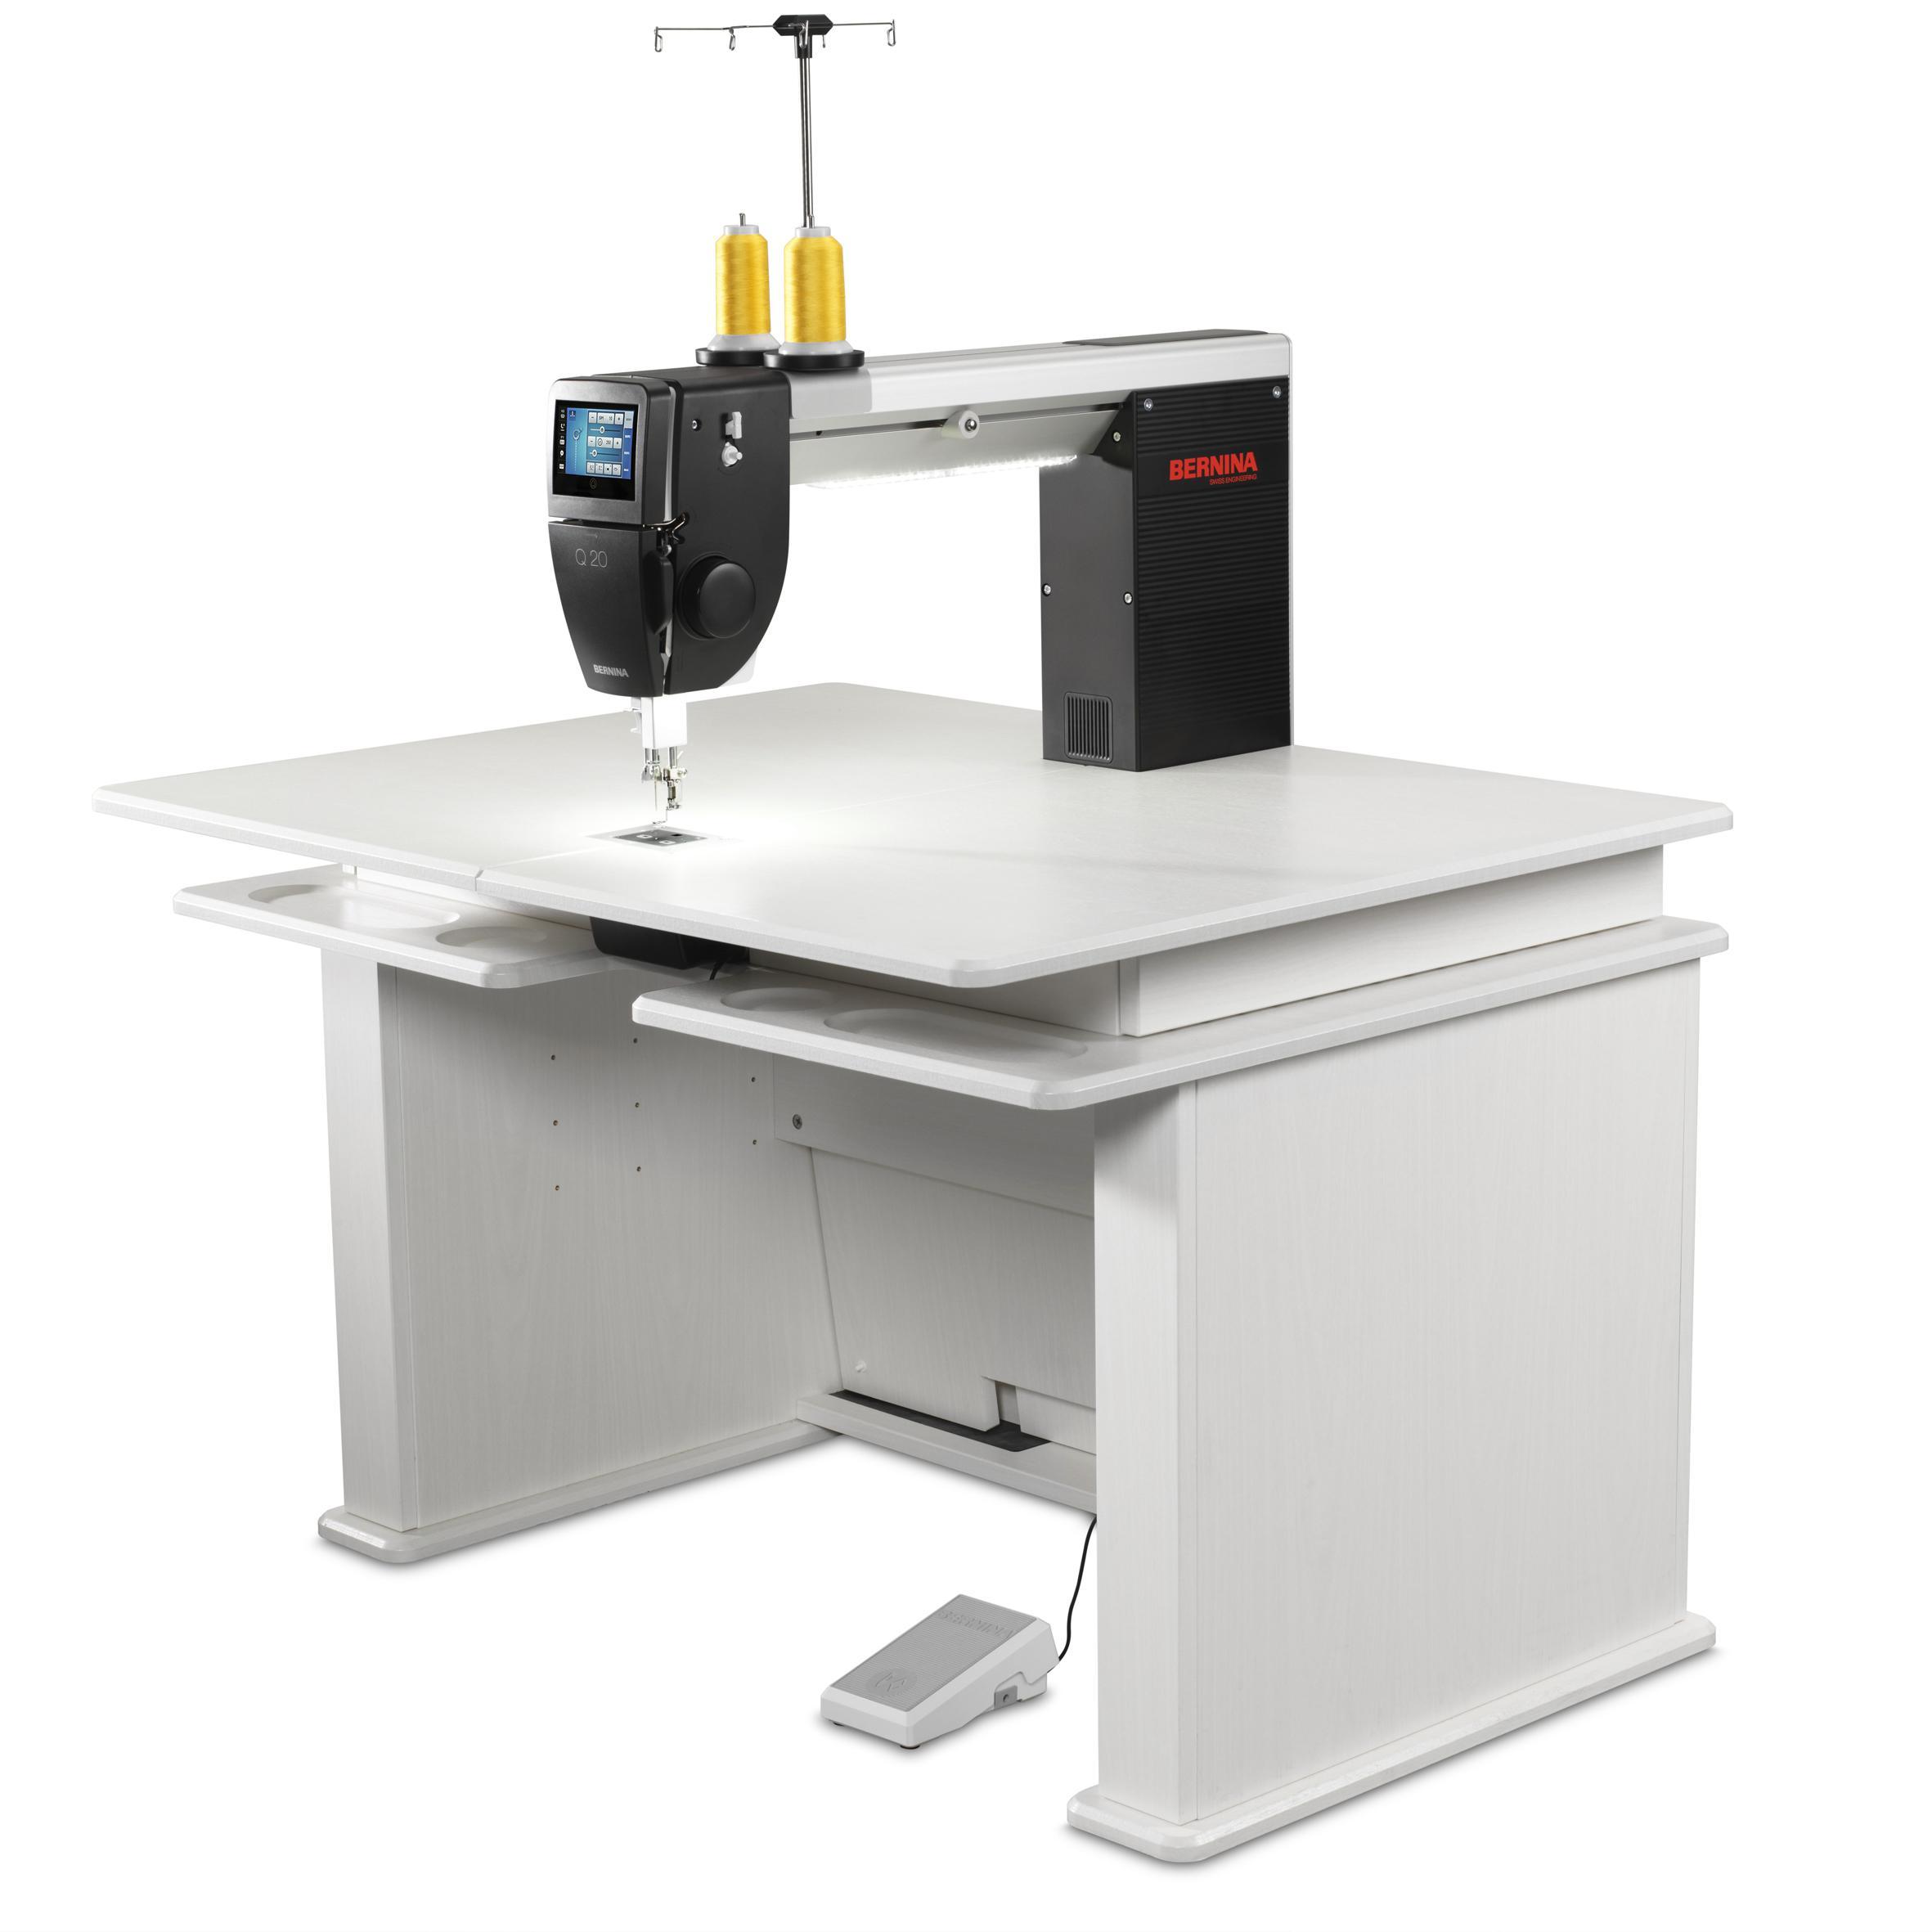 Bernina-Q20-BQ20-Quilting-Machine-1